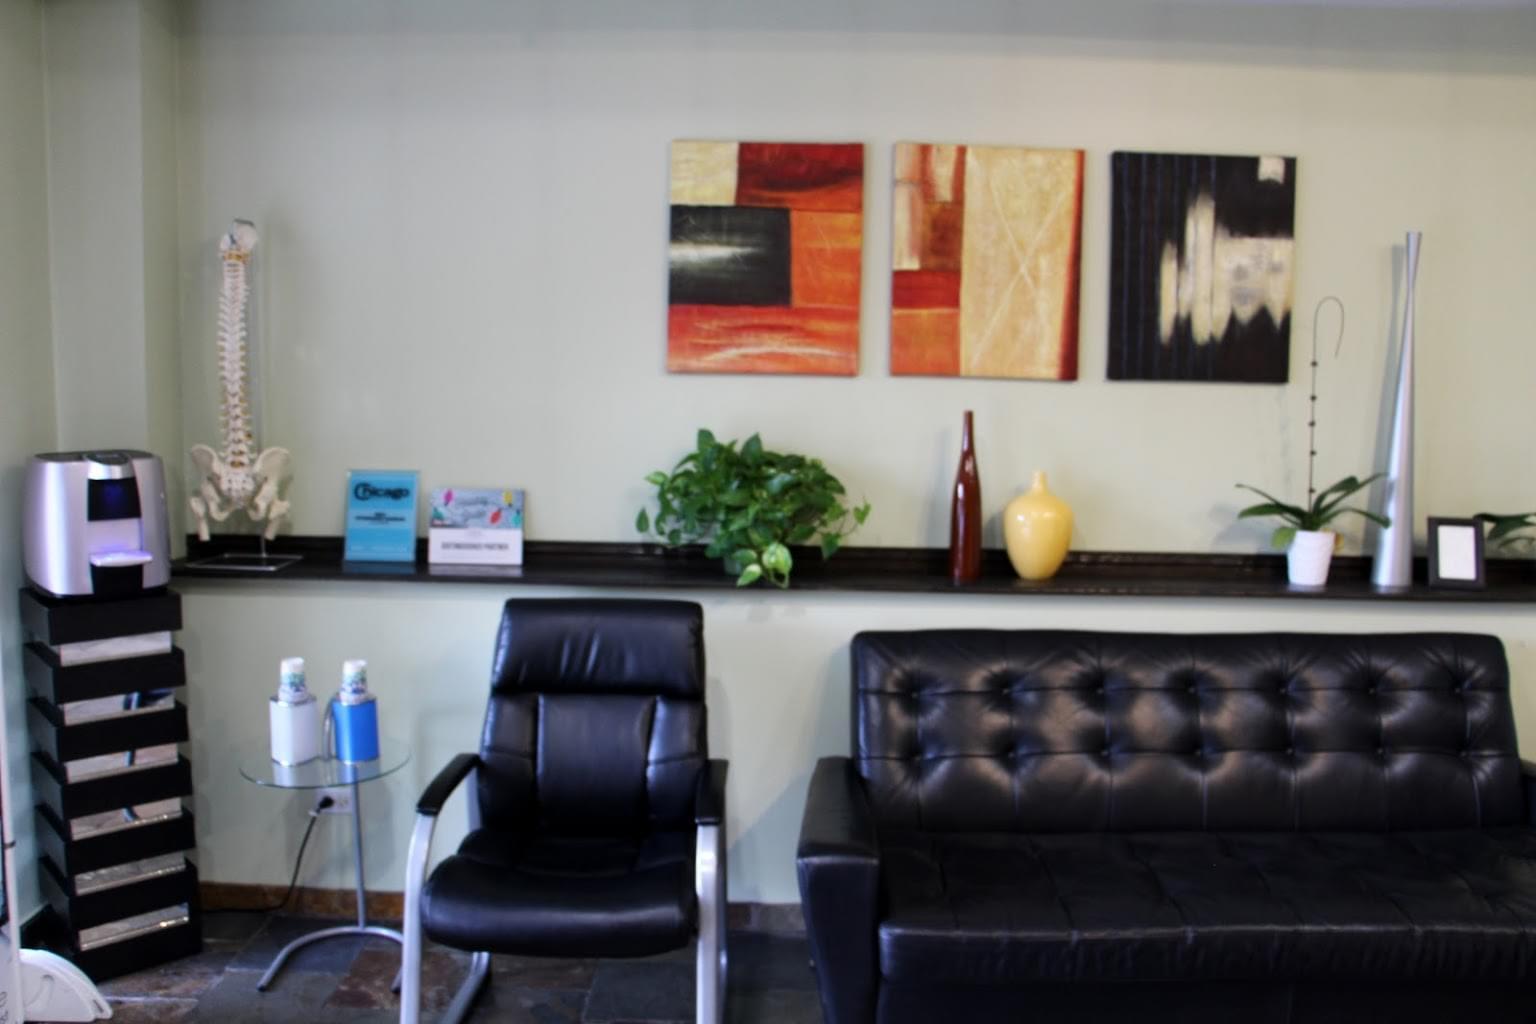 lillieAnn's Massage & Skin Care – Chicago, IL – See-Inside Massage Therapist